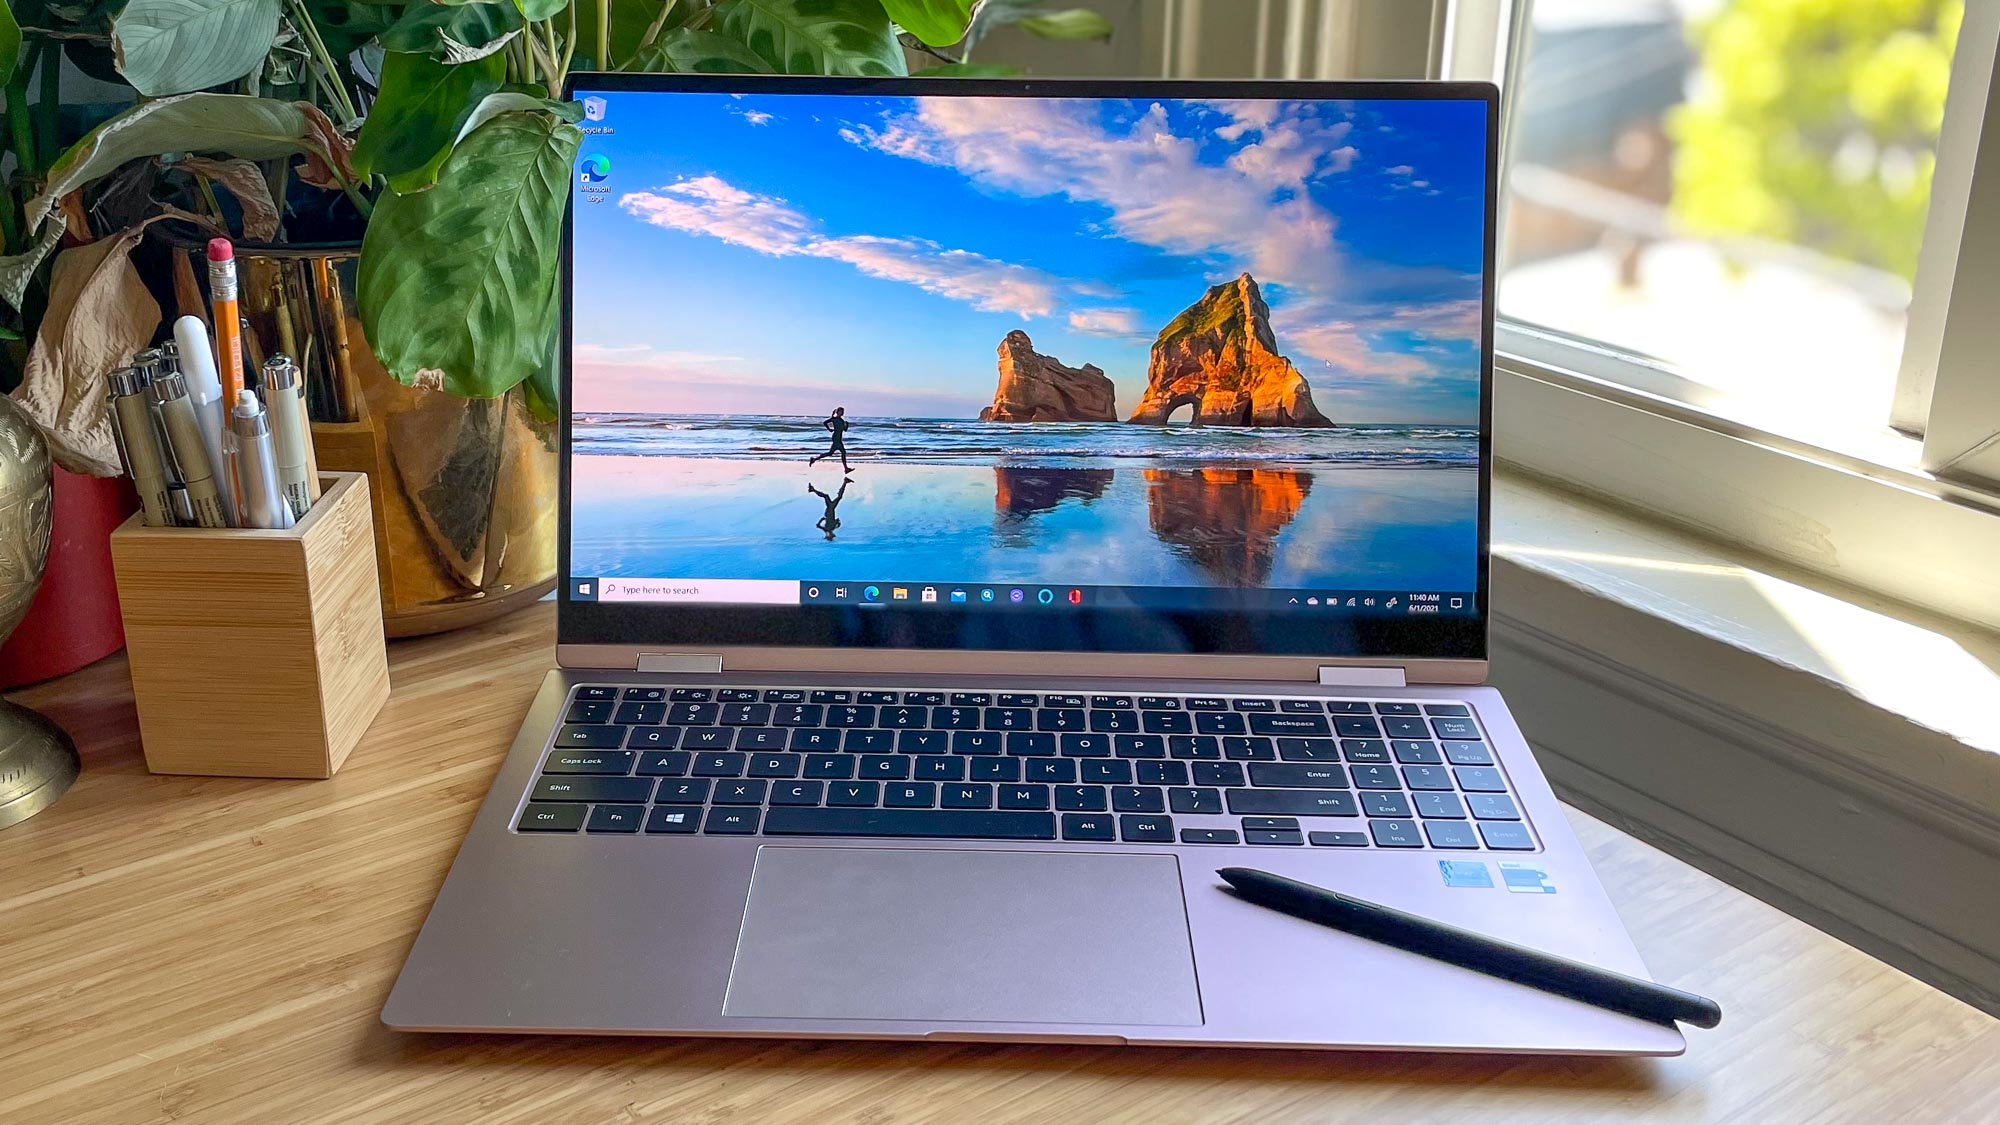 best 2-in-1 laptops: Samsung Galaxy Book Pro 360